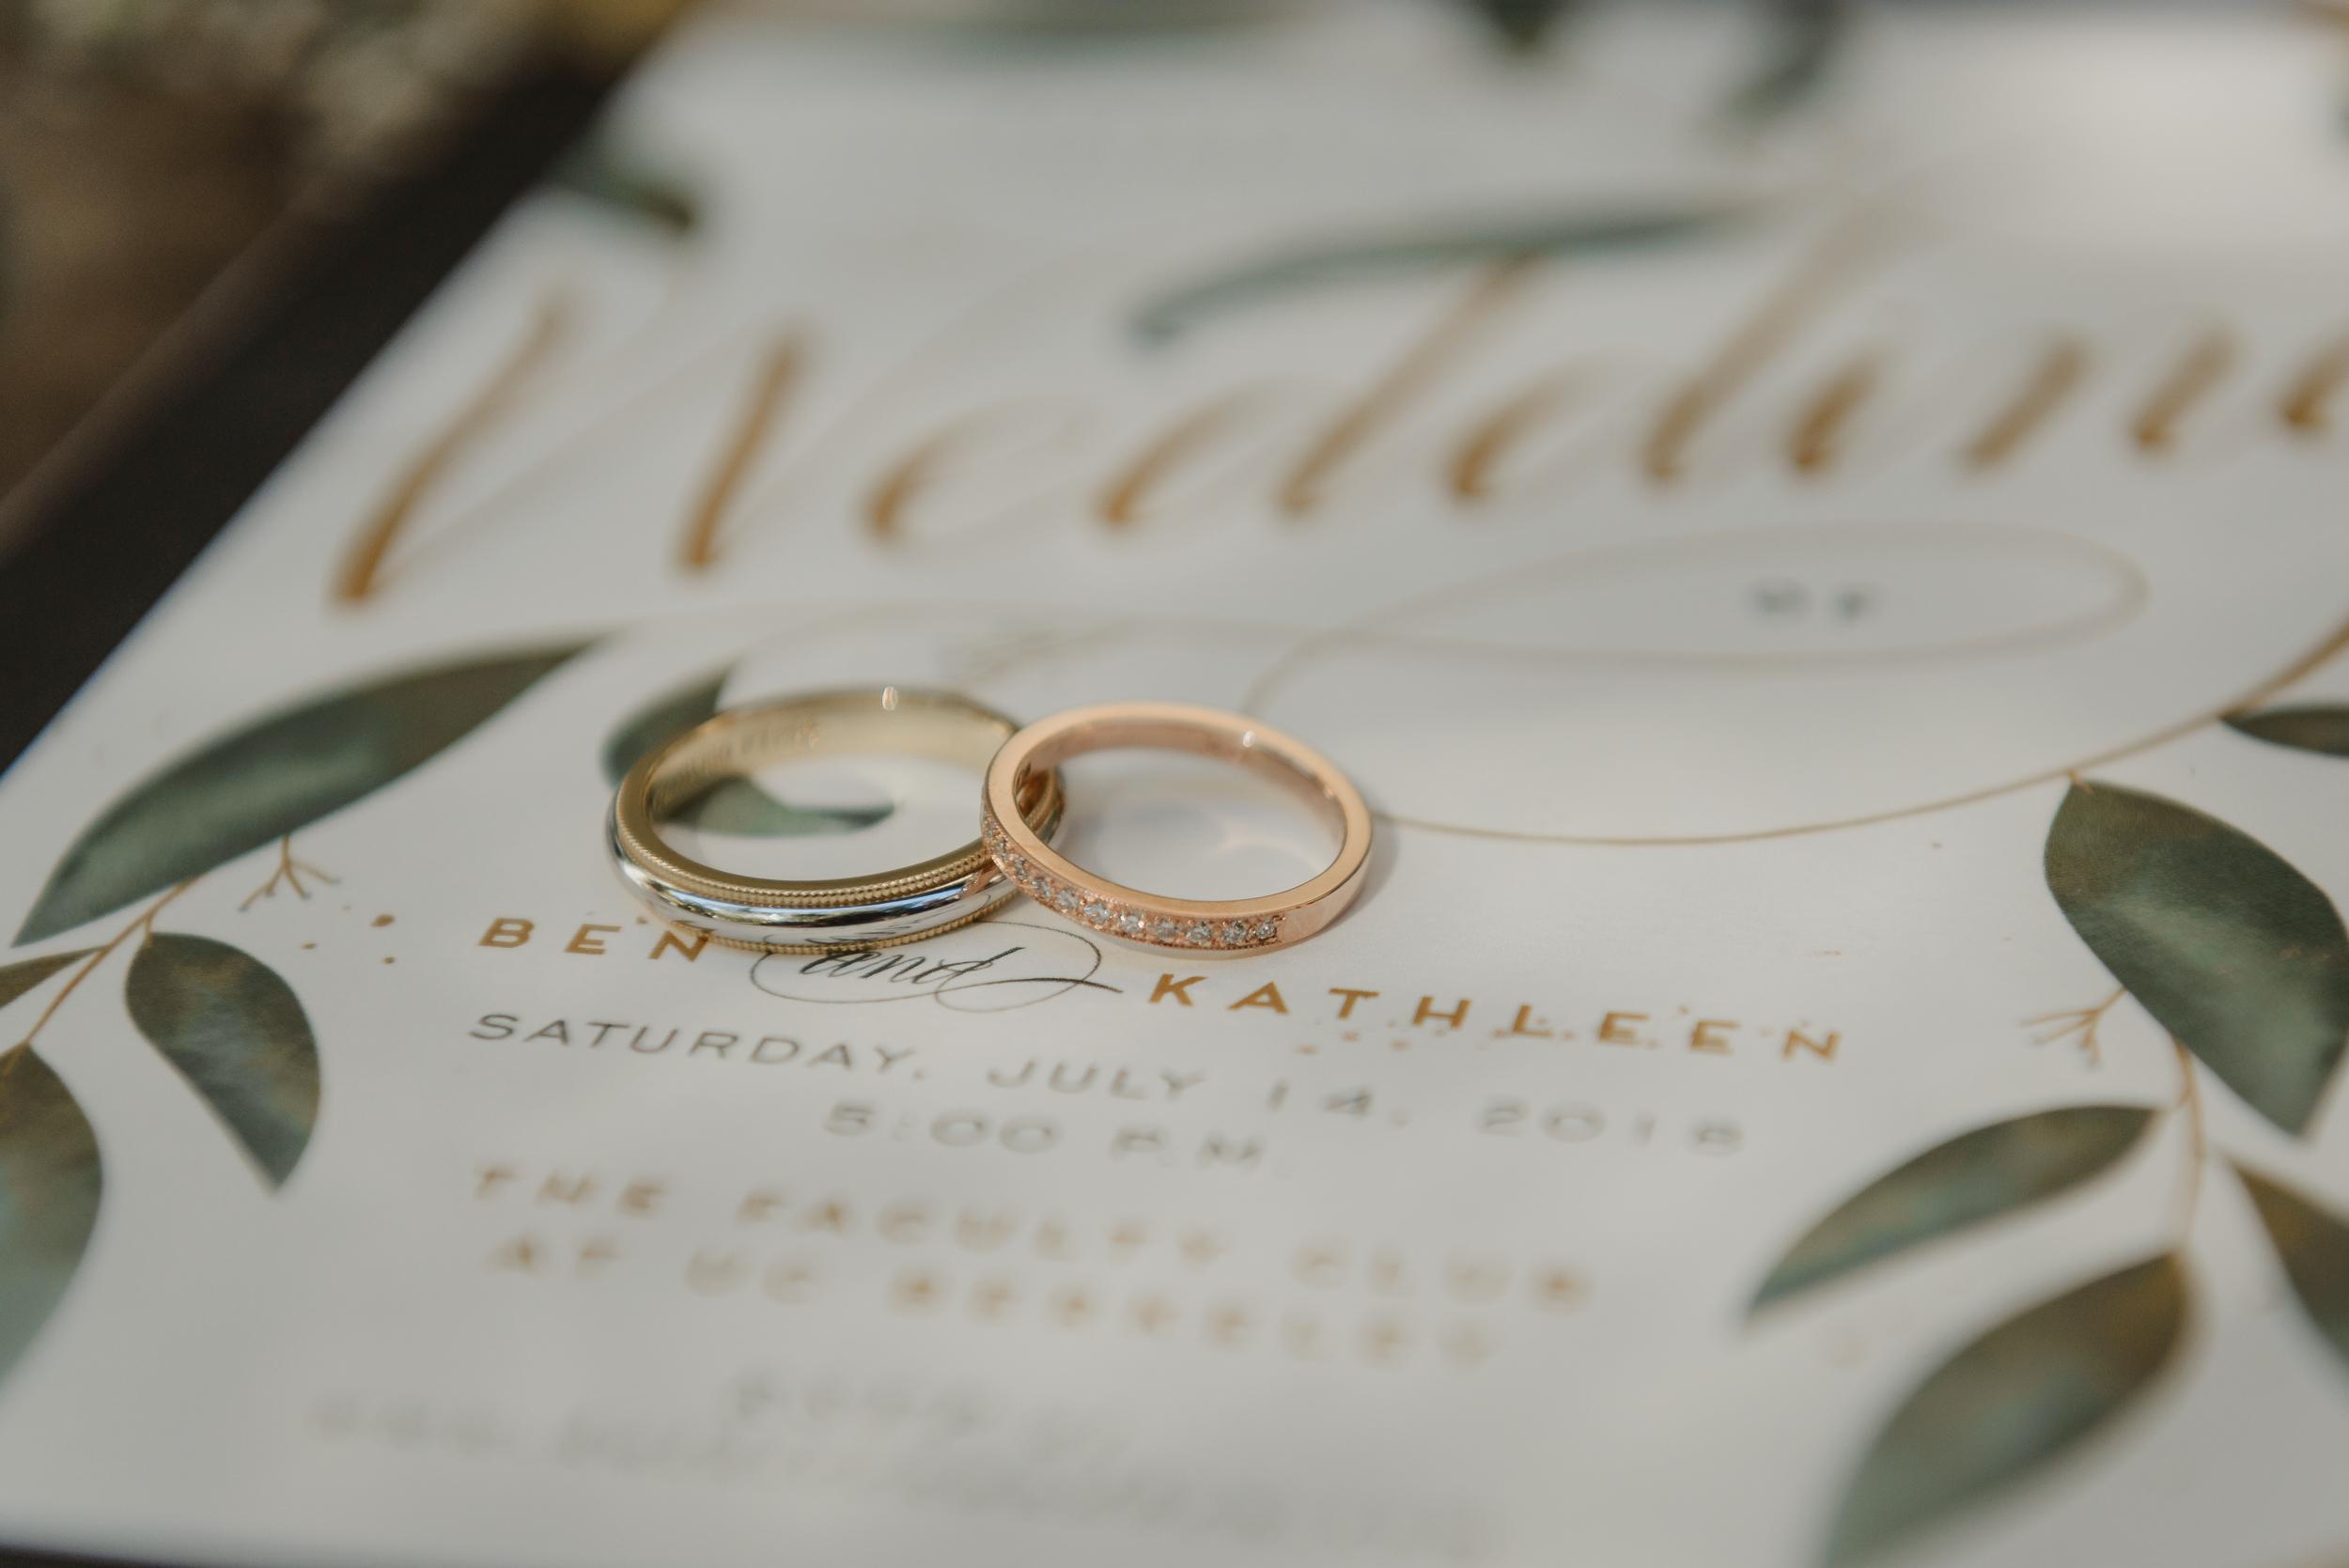 01-berkeley-uc-faculty-club-wedding-kb-vivianchen-007.jpg